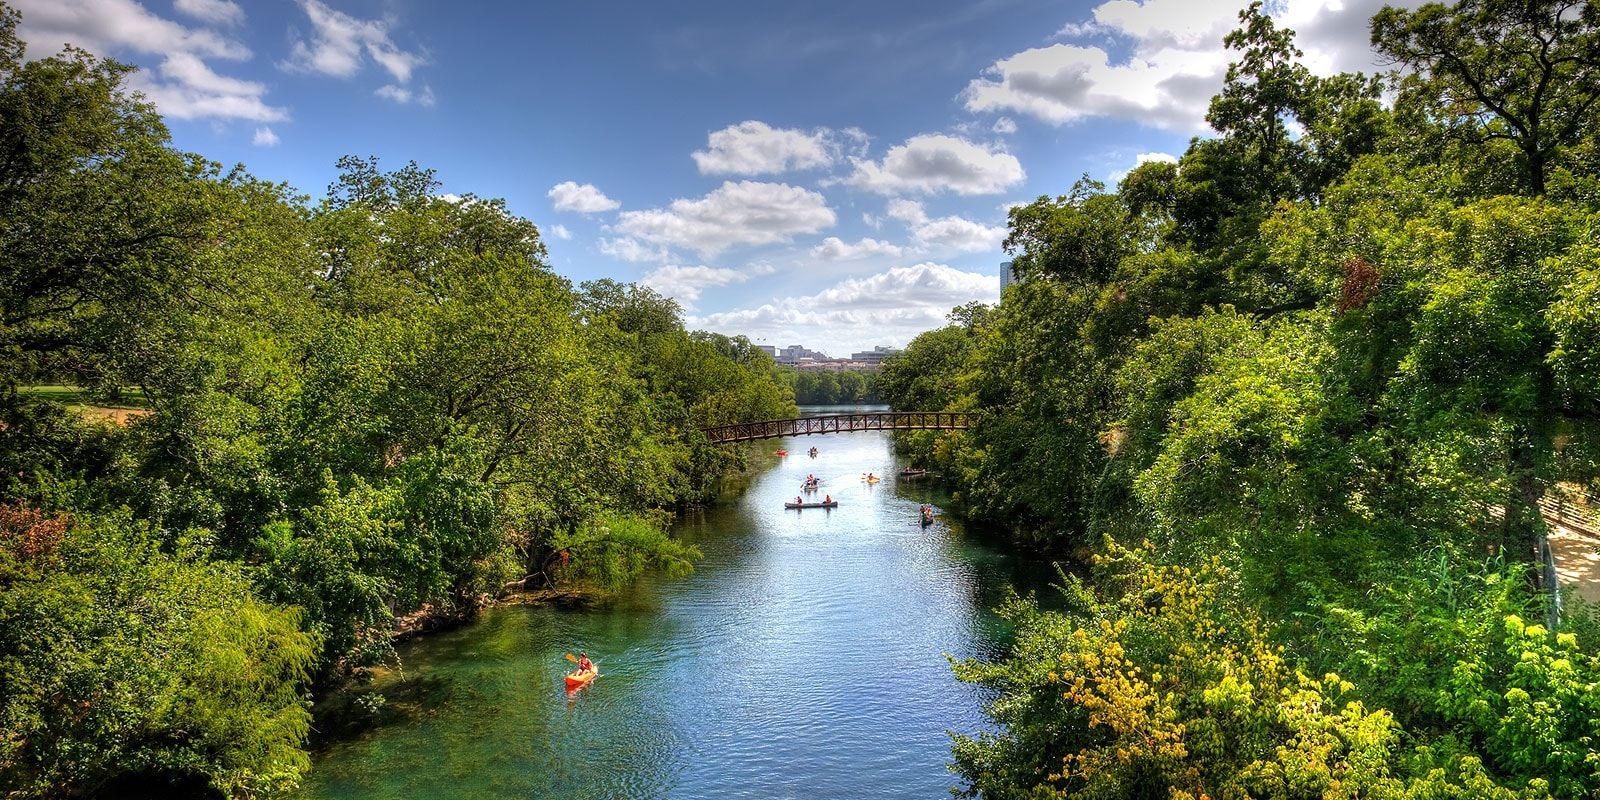 Lakeview of Zilker Metropolitan Park